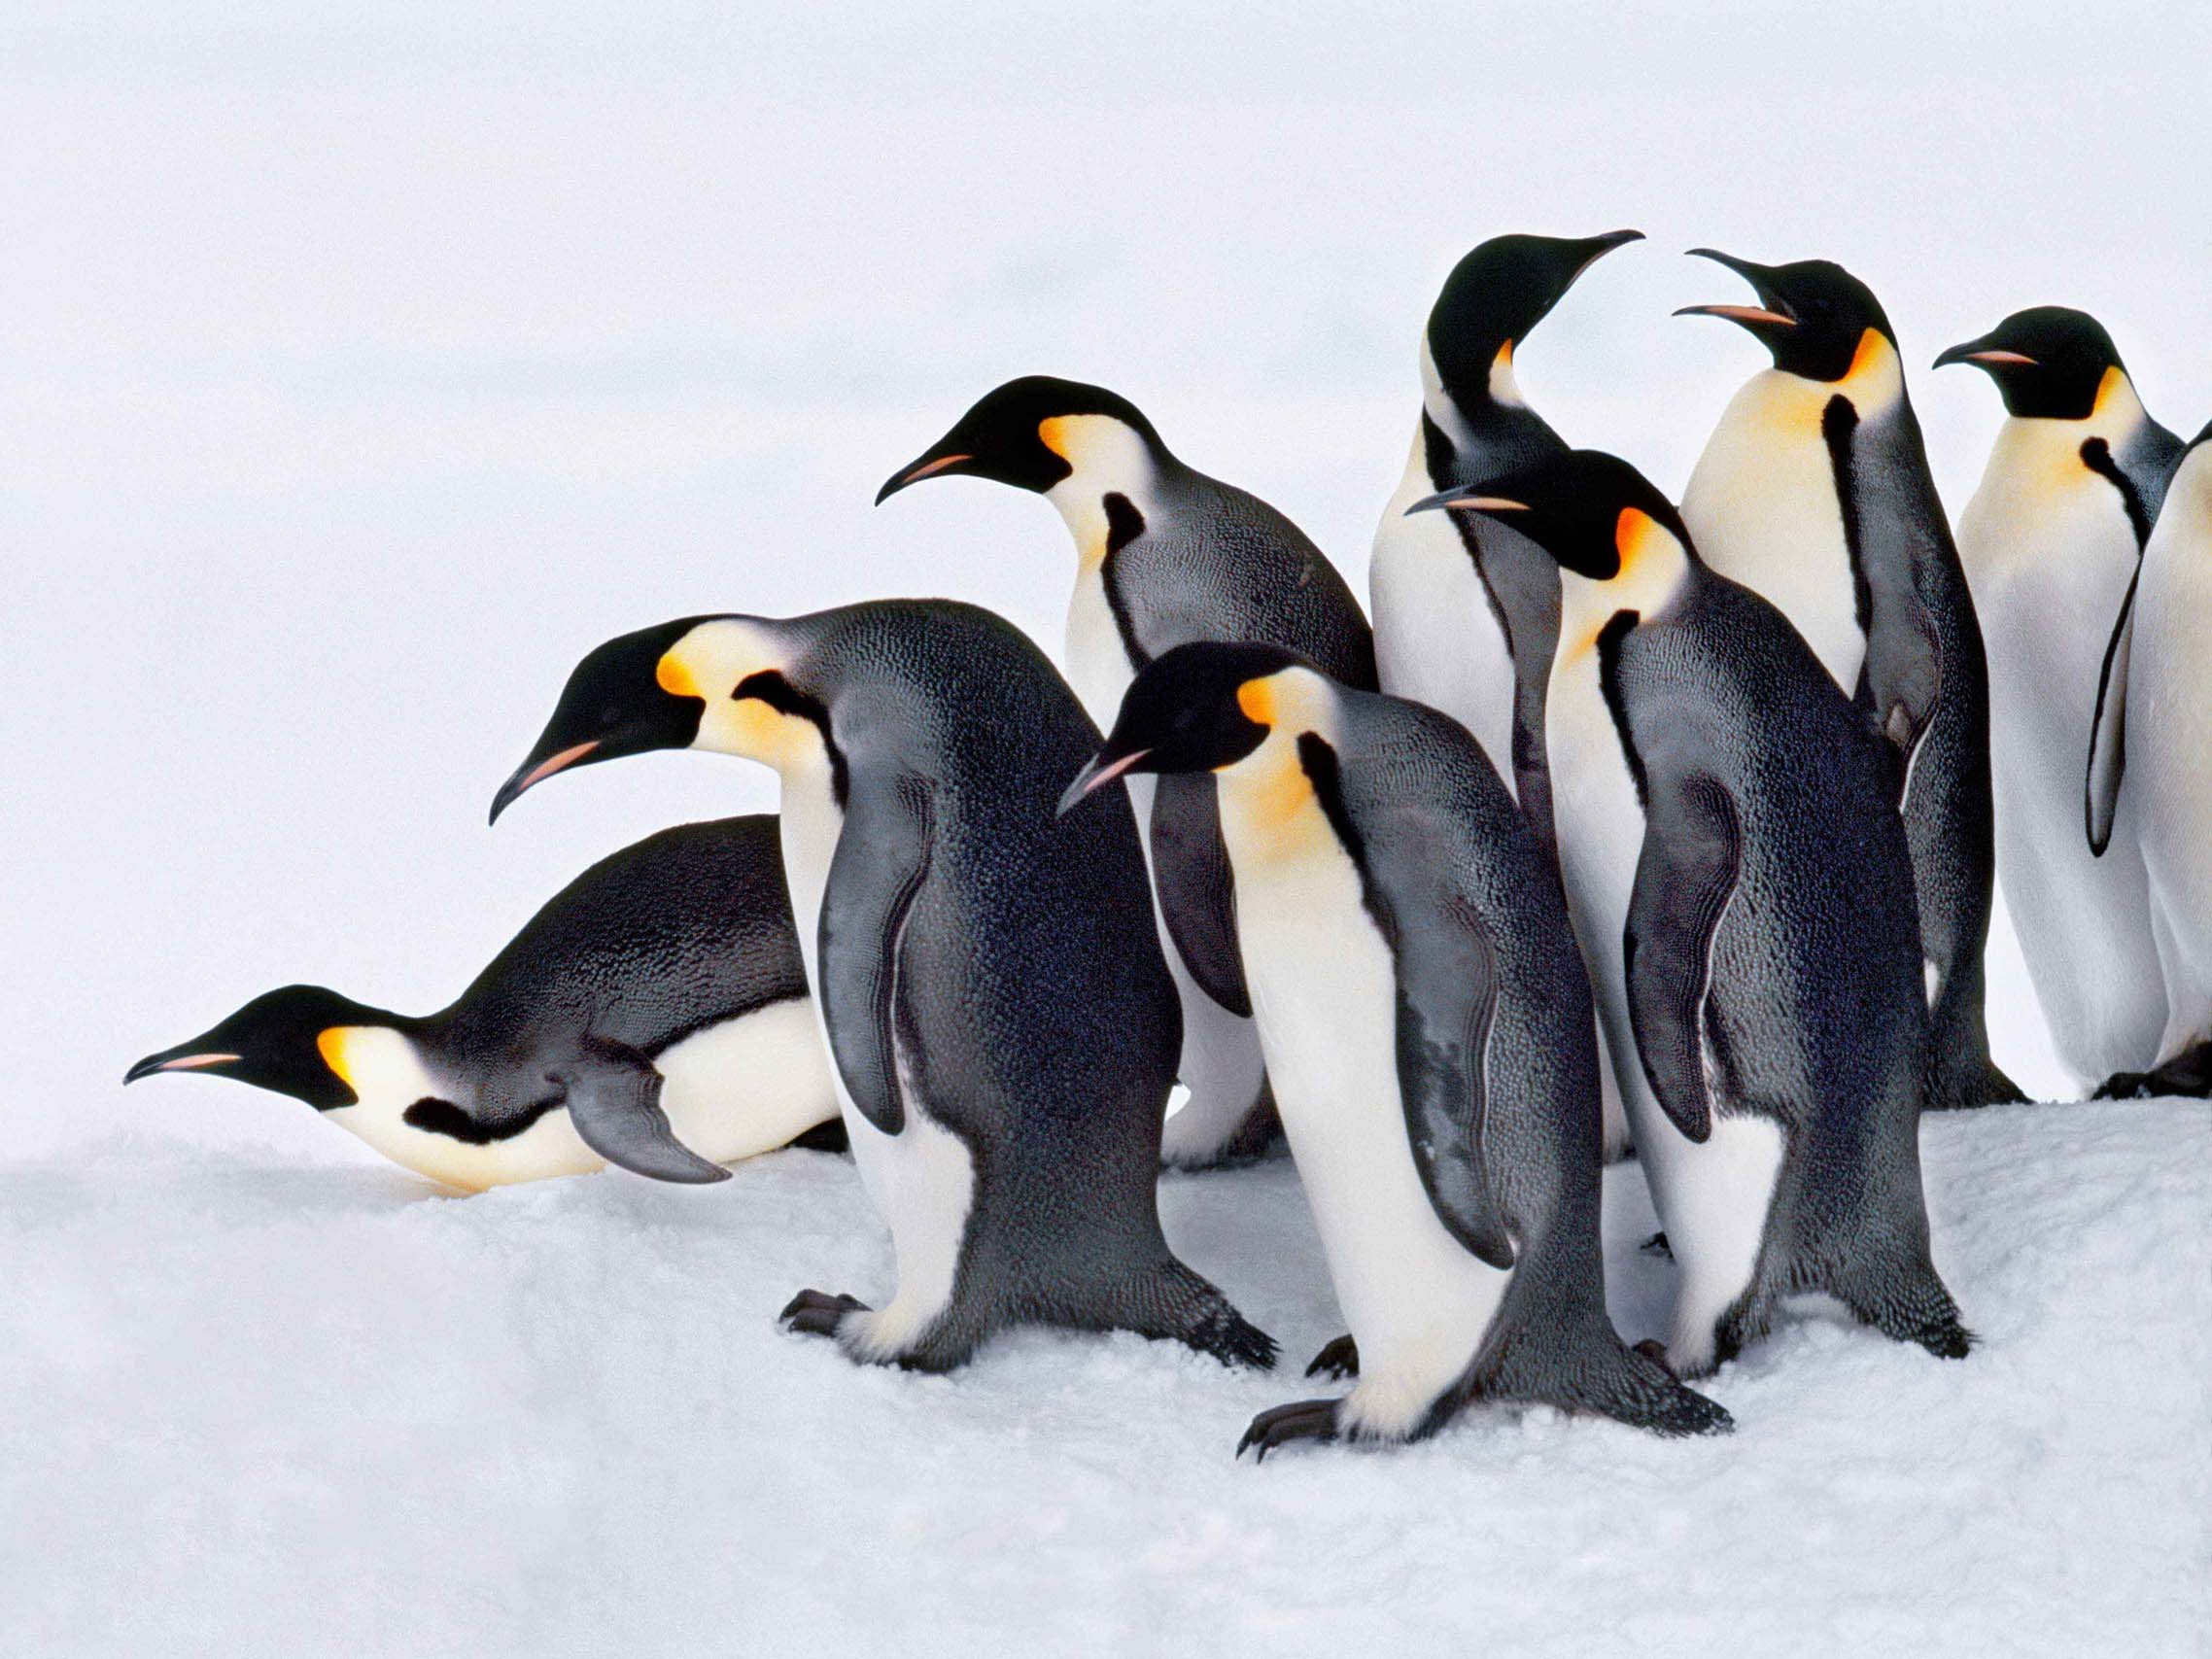 meet the penguins scholastic